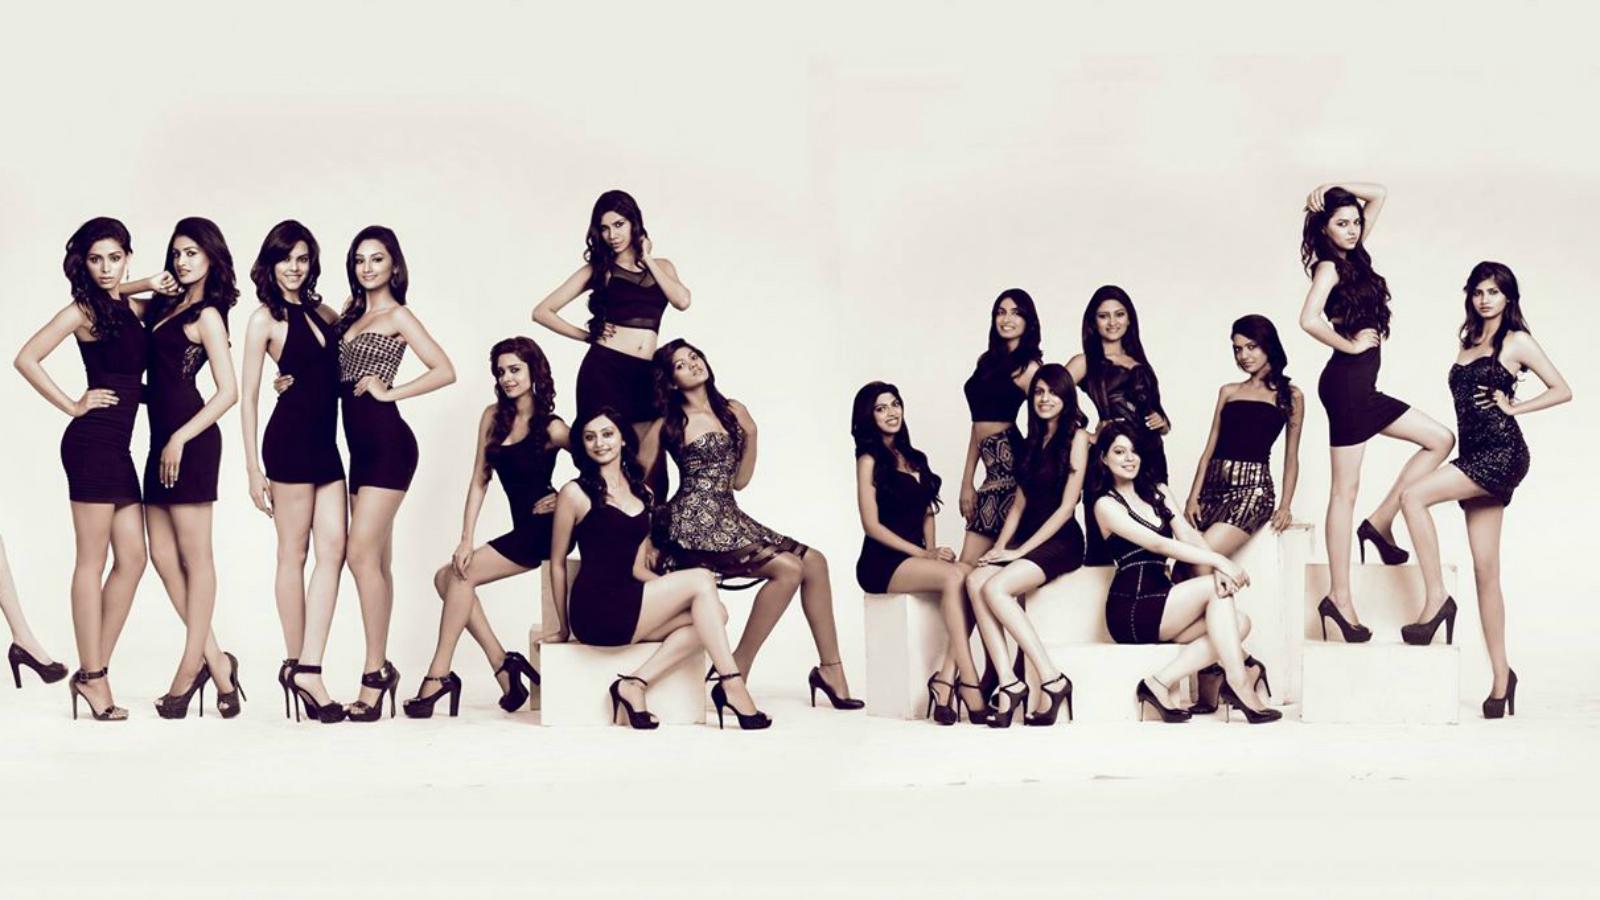 Facebook hot college girls College Girls